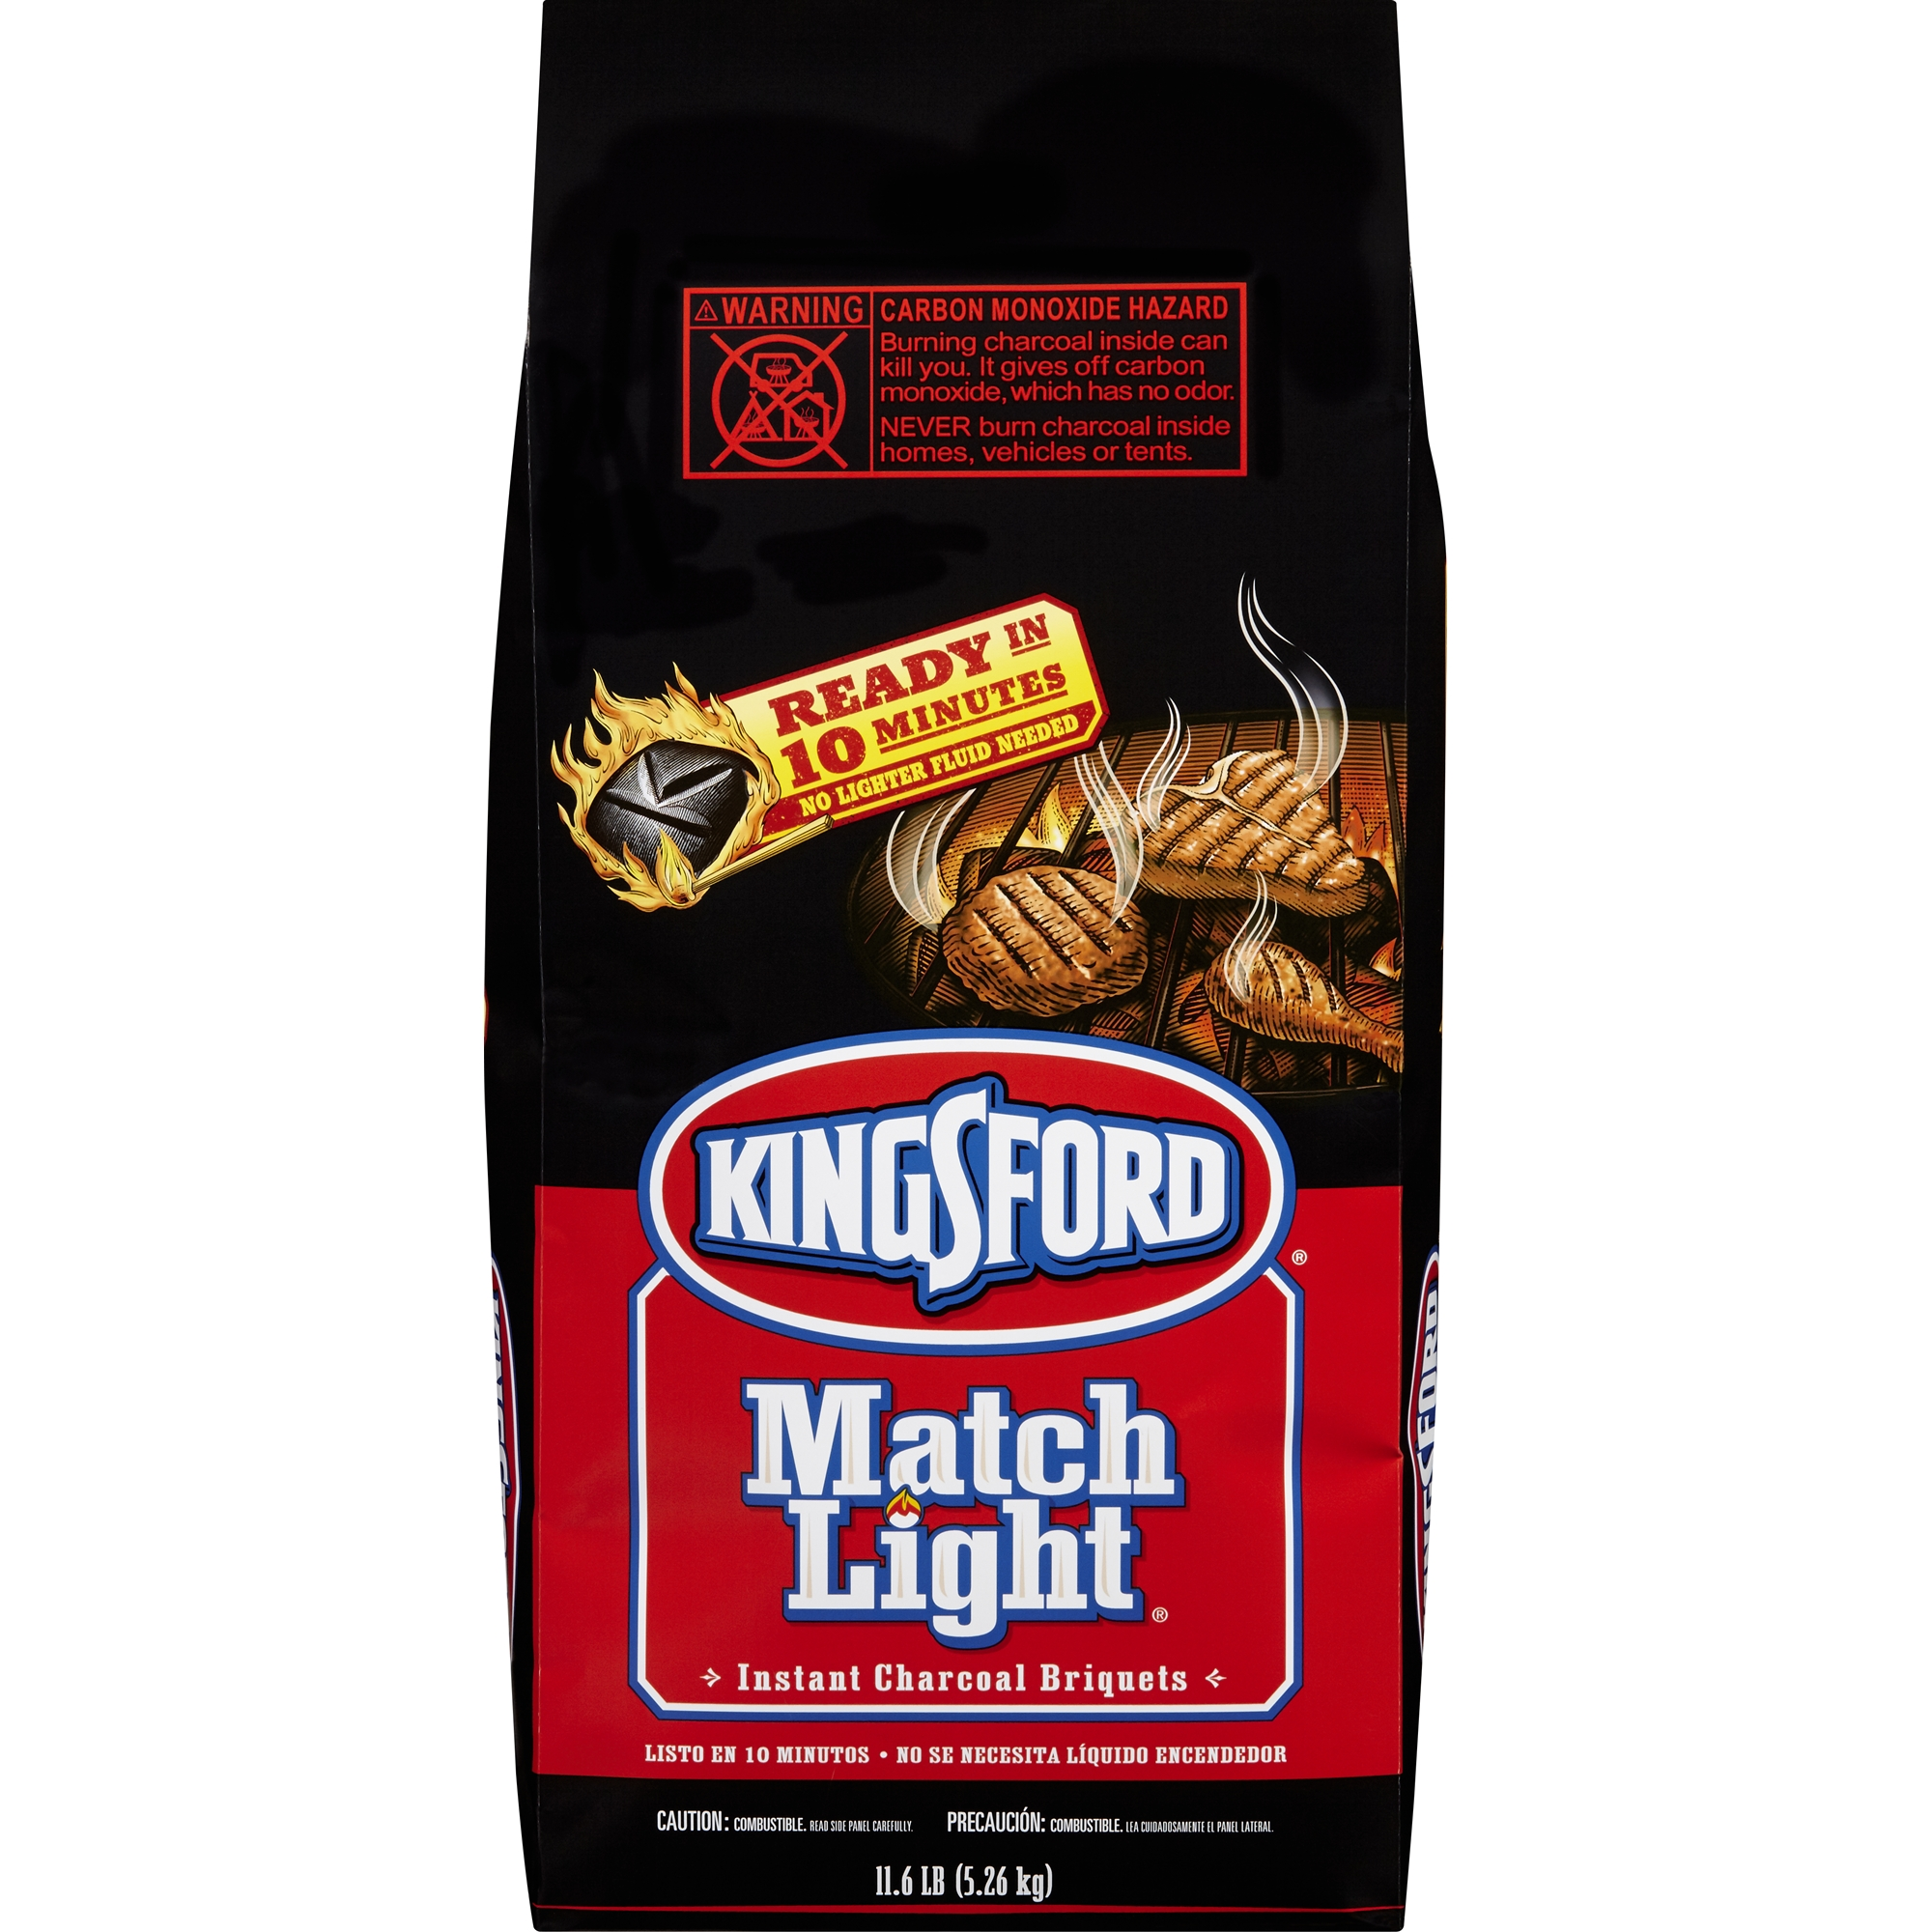 Kingsford Match Light Charcoal, 11.6 Pounds, 11.6 LB